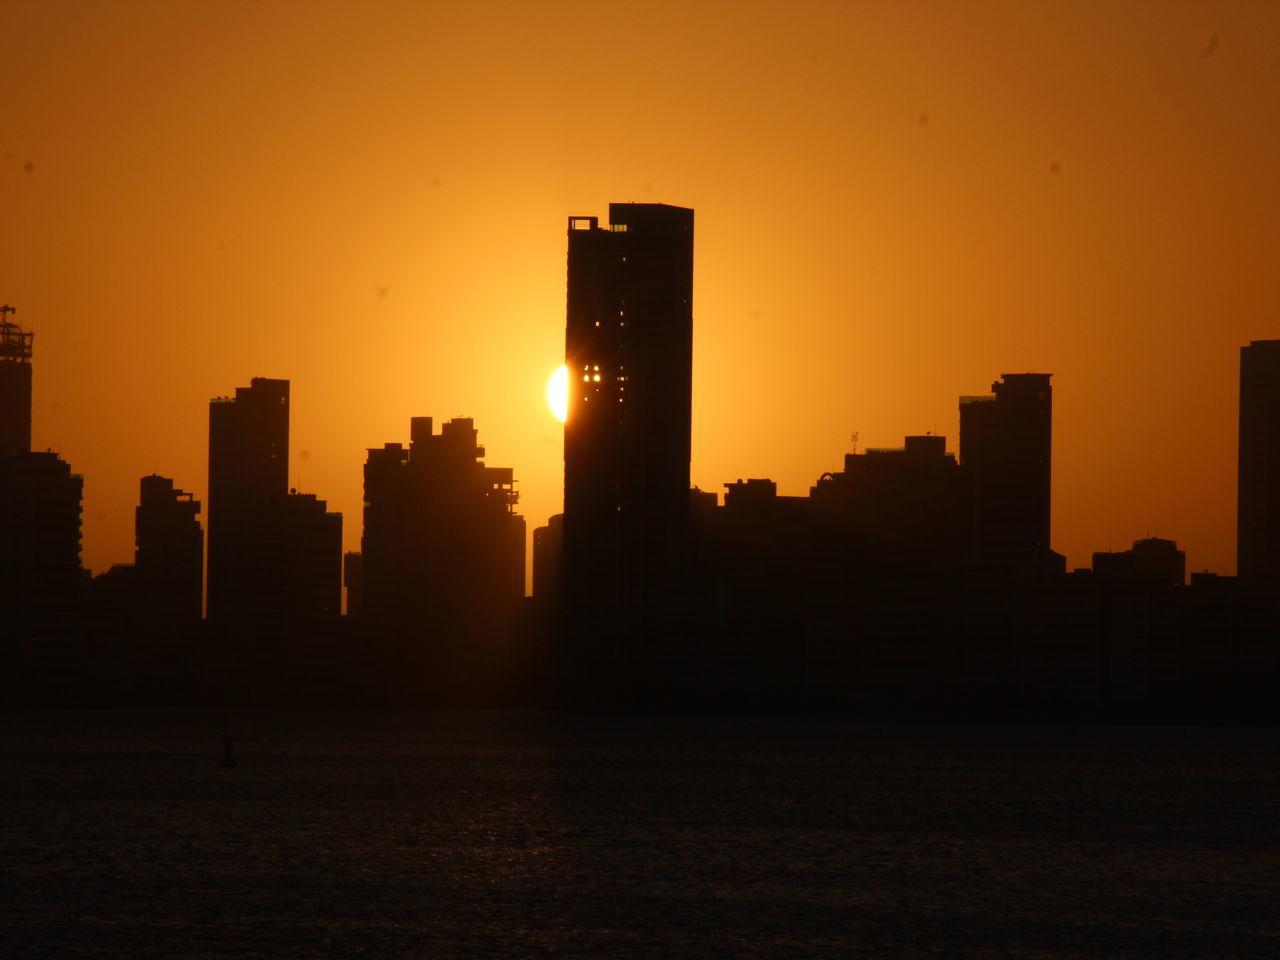 sunset, architecture, building exterior, silhouette, orange color, built structure, skyscraper, sun, sky, travel destinations, city, no people, outdoors, cityscape, urban skyline, beauty in nature, nature, growth, scenics